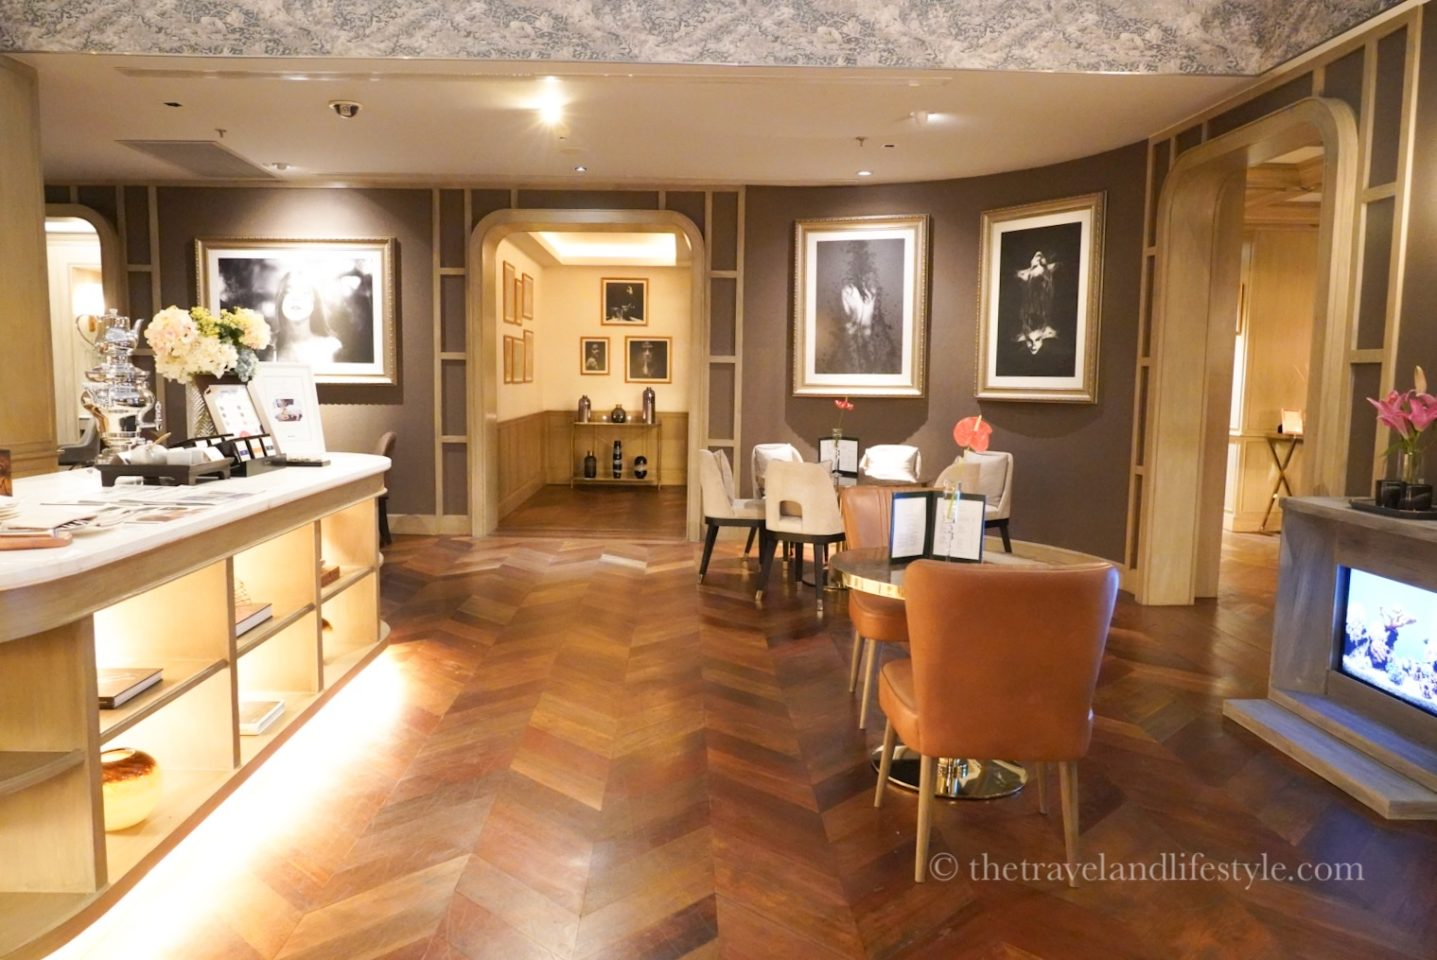 dsc08598 - akyra Thonglor Bangkok -  バンコクのラグジュアリーデザイナーズホテル